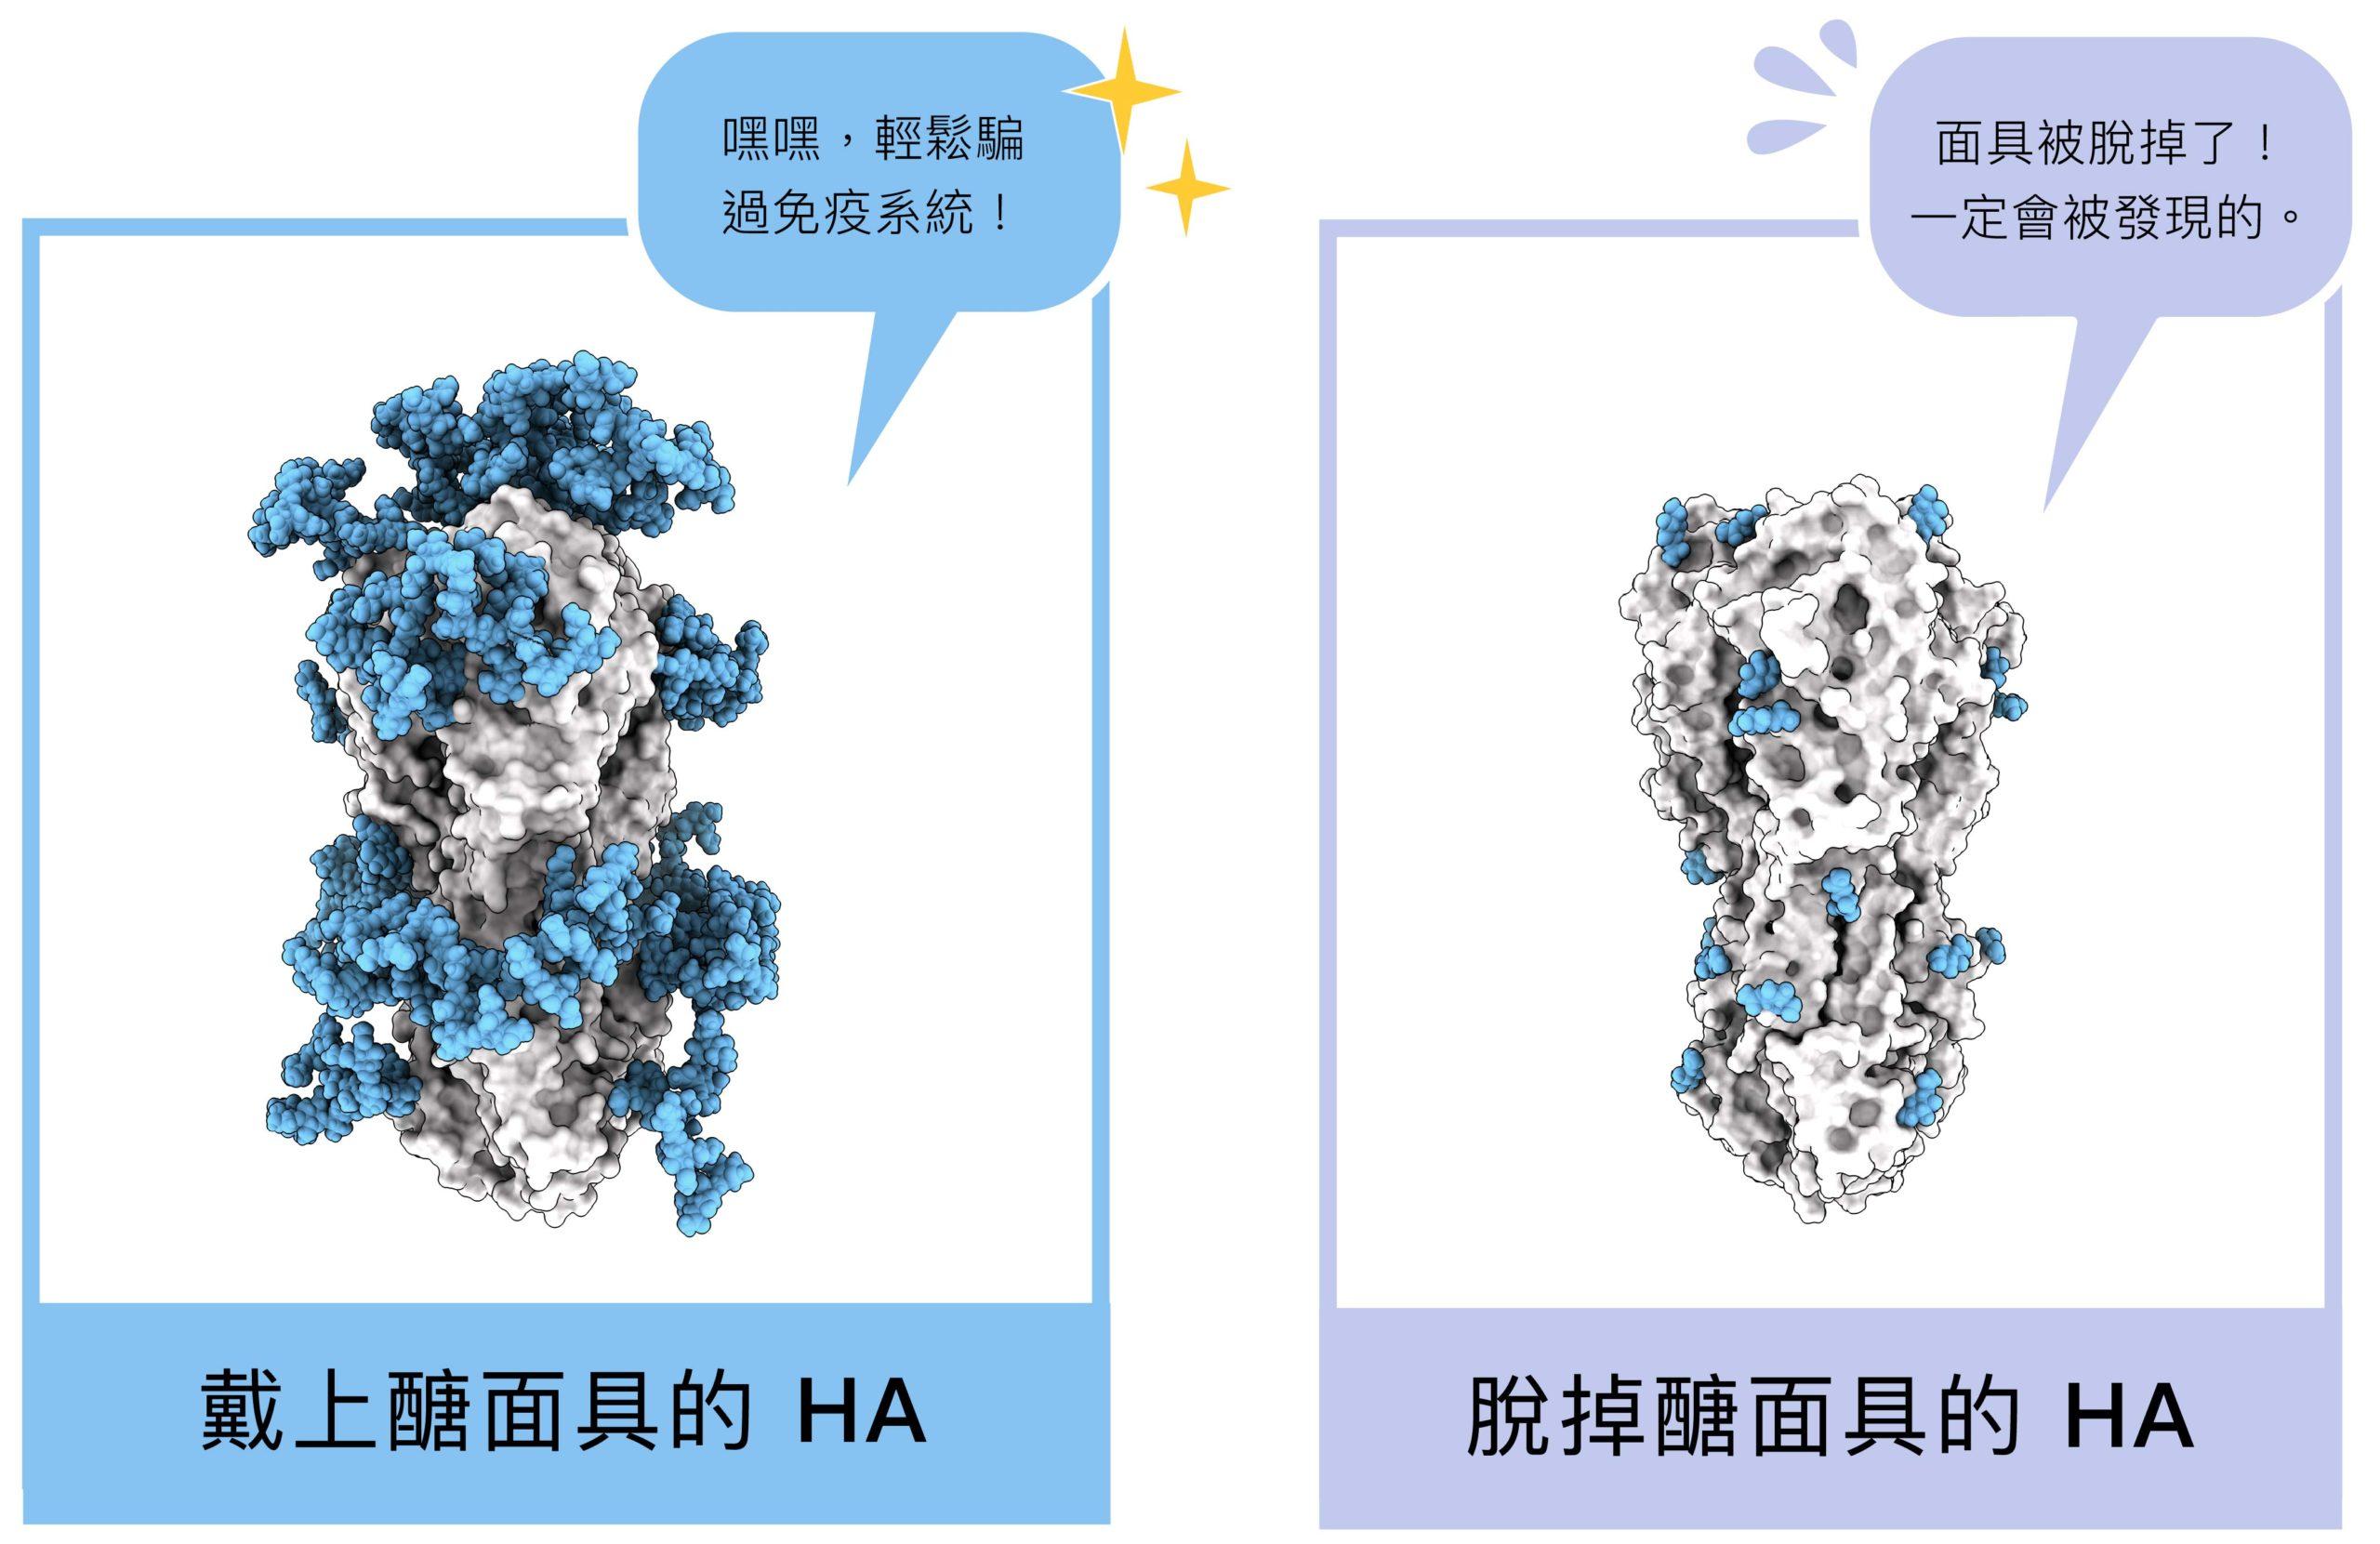 HA 醣蛋白結構,藍色部分即為醣面具,左圖為原本布滿醣分子的結構,右圖為研究員拿掉絕大多數醣分子後、還原 HA 的真面目。圖│研之有物 (資料來源│馬徹實驗室)